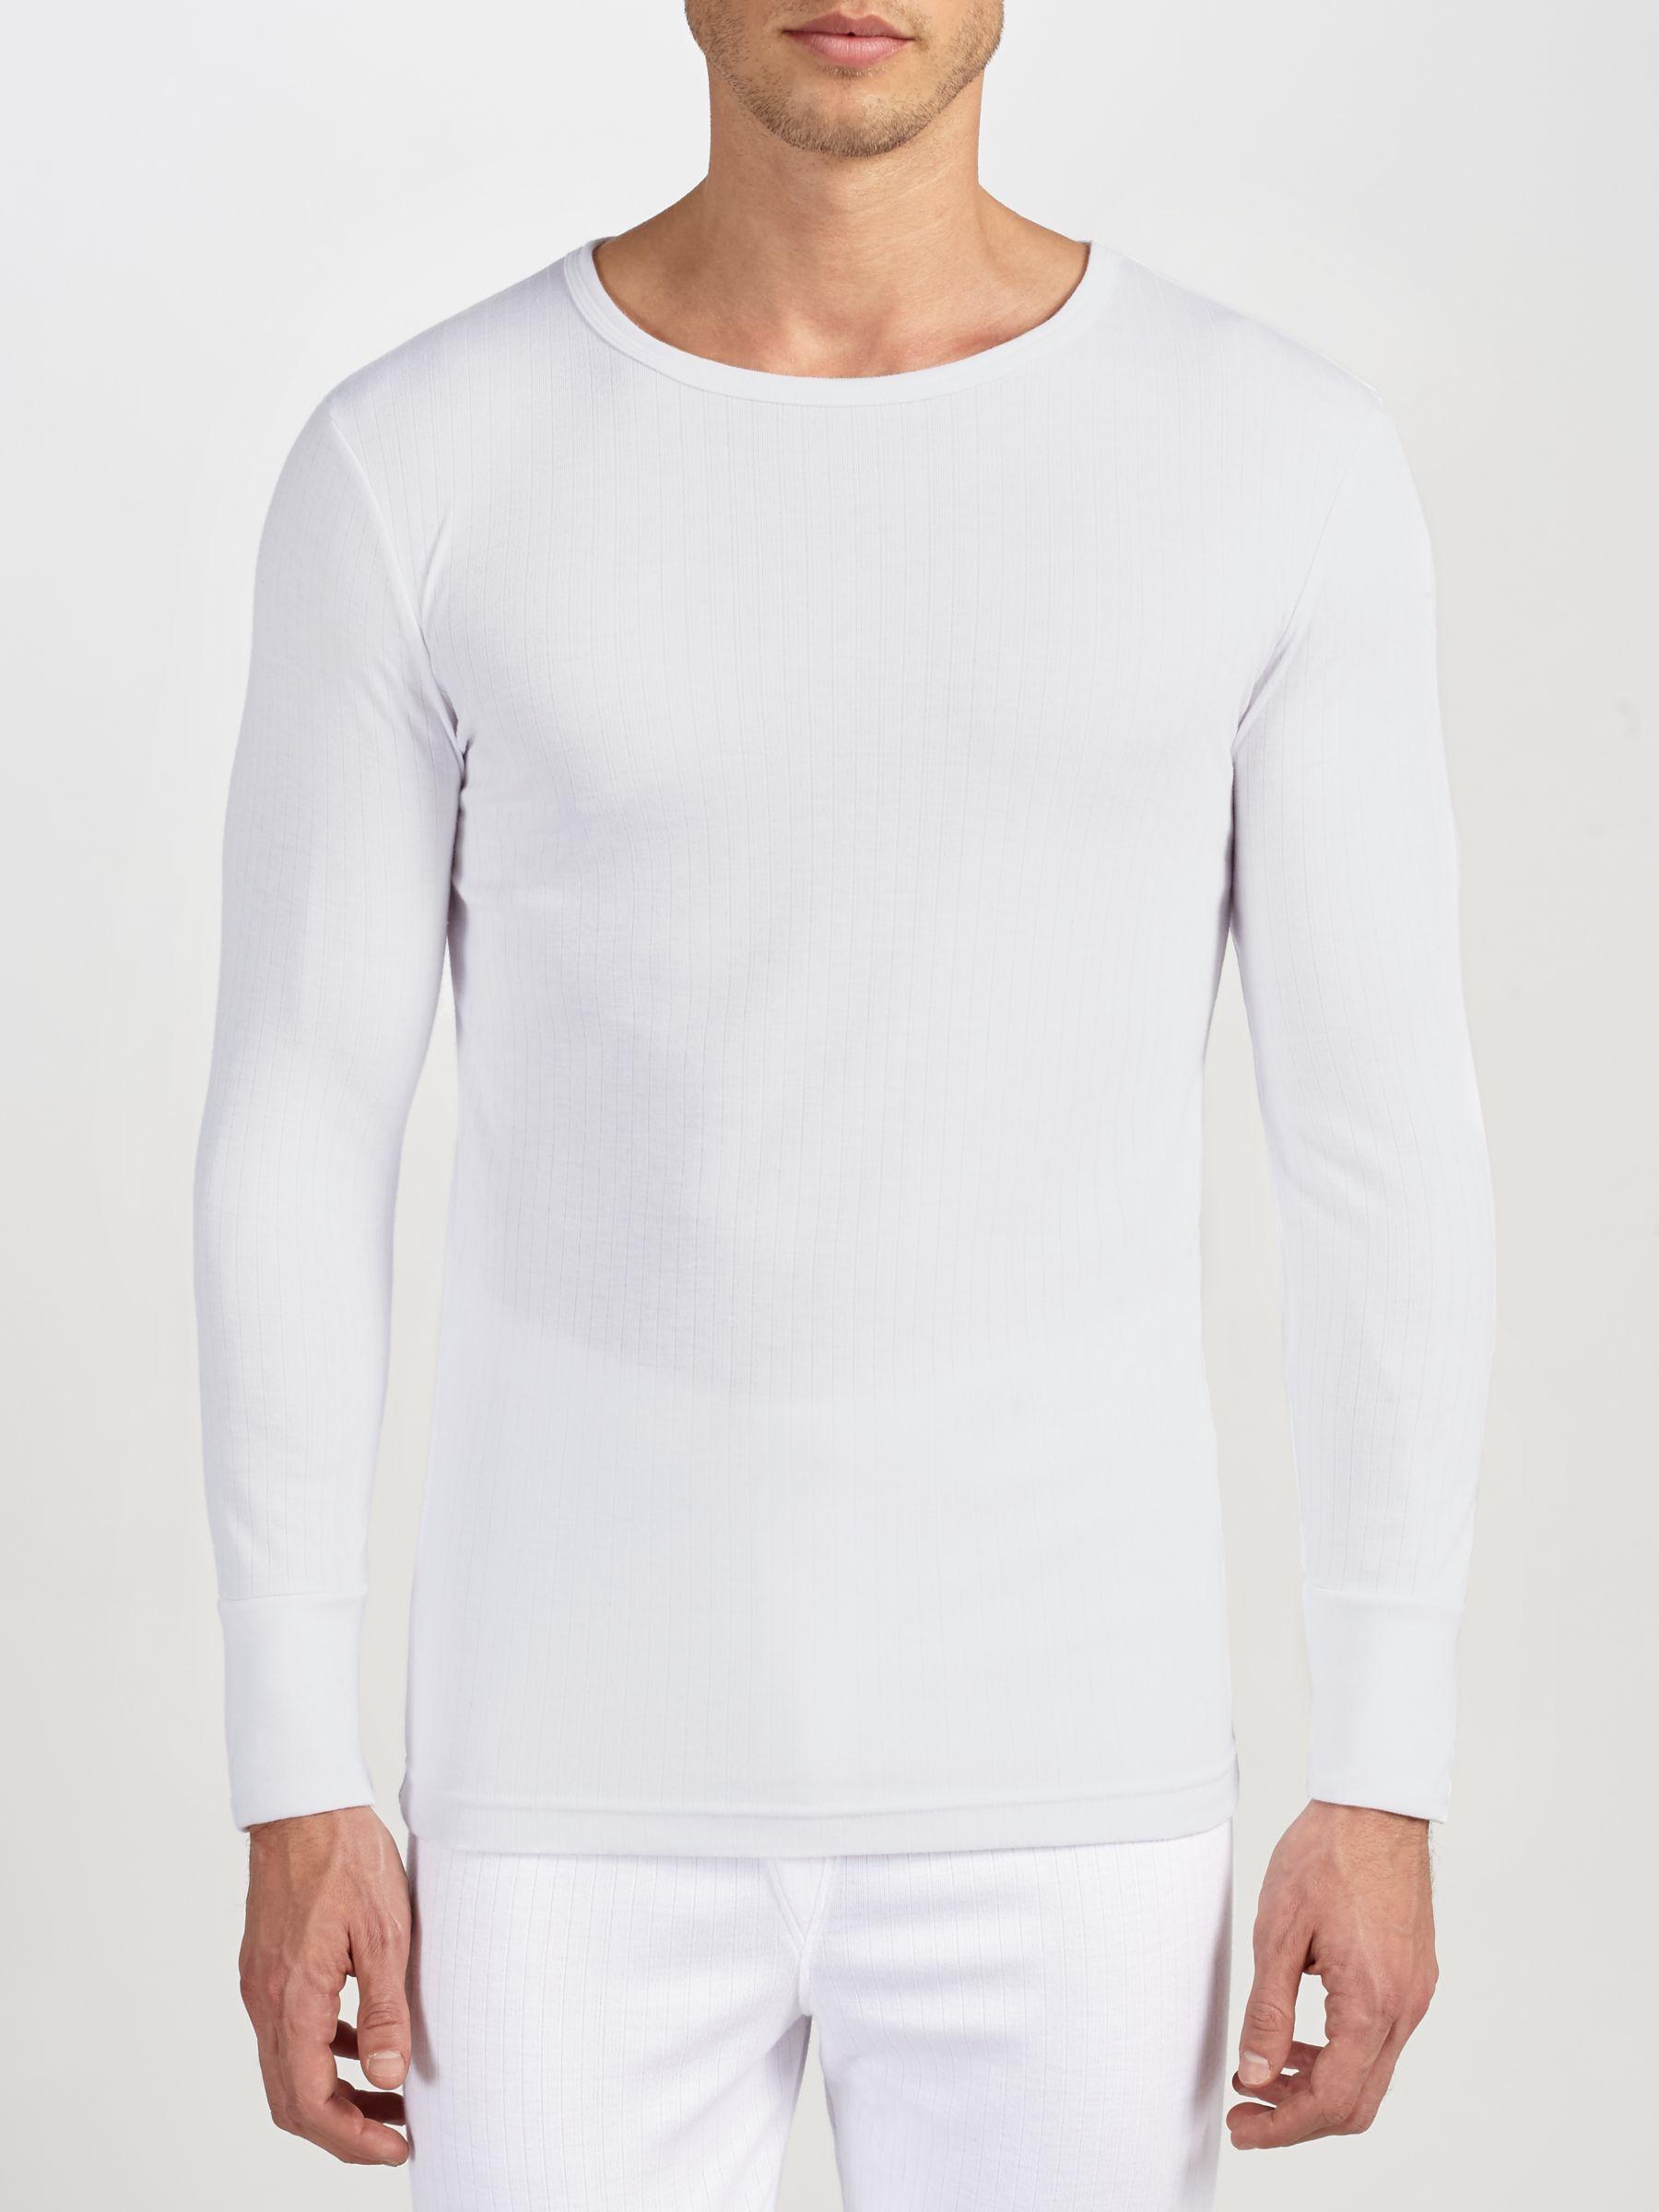 John Lewis & Partners John Lewis & Partners Long Sleeve Thermal Vest